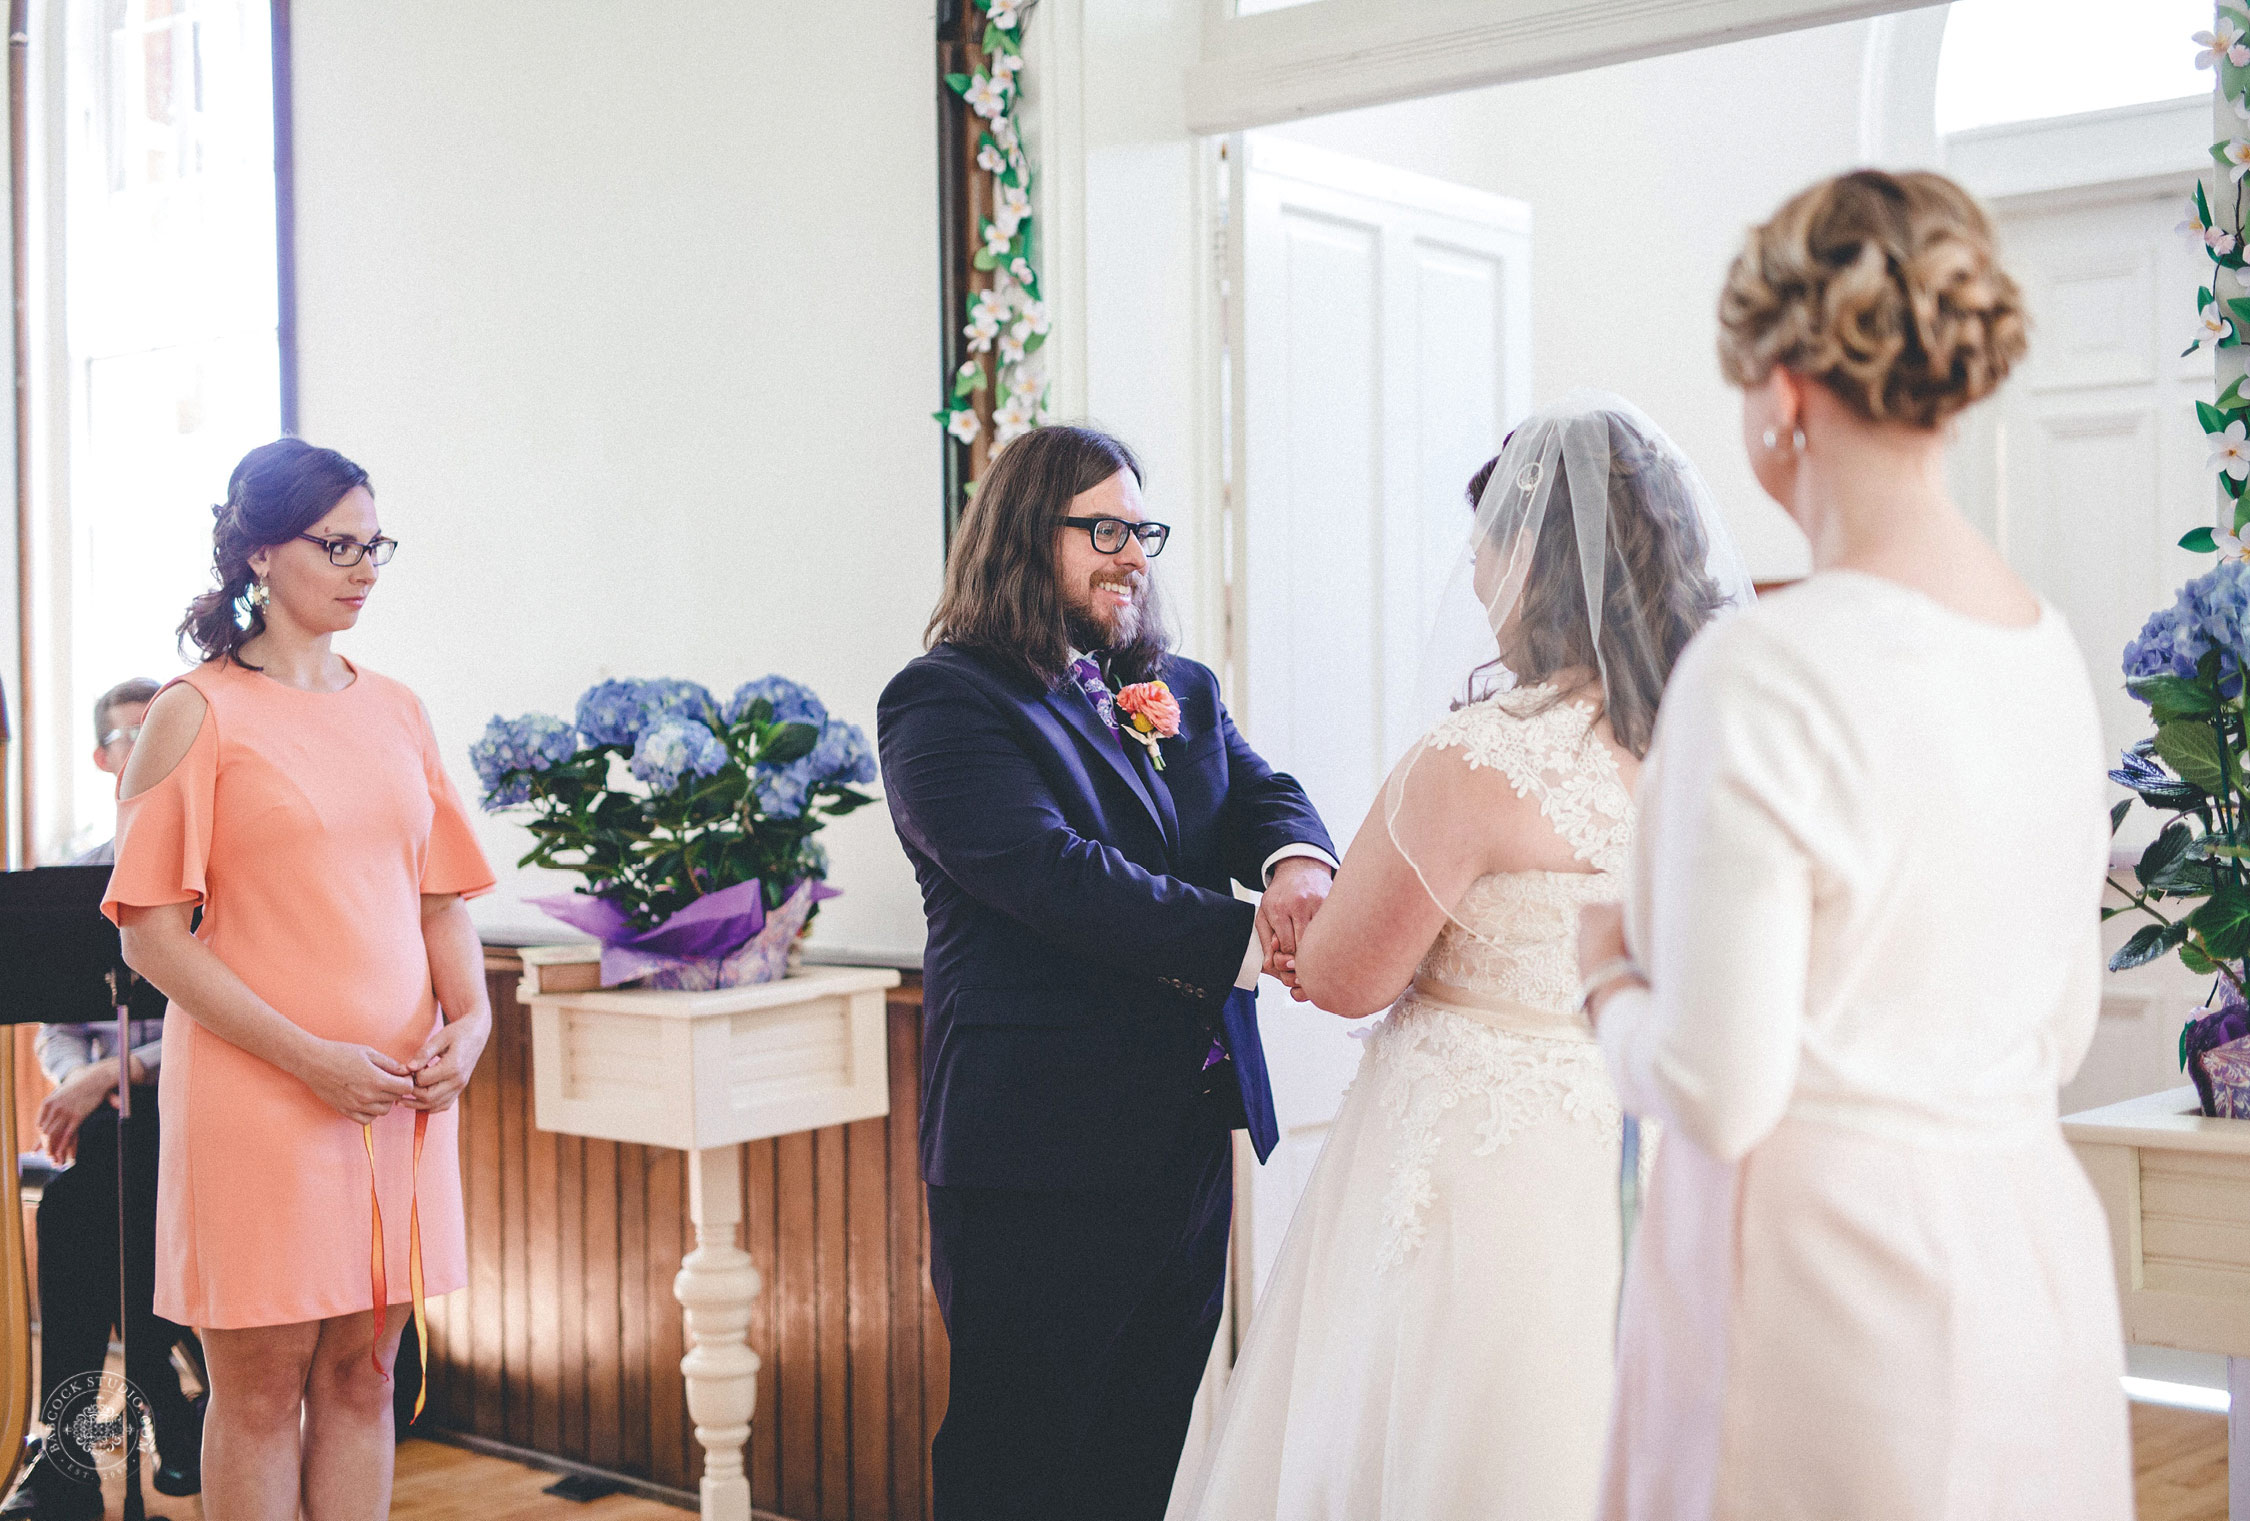 nicole-brendarn-school-house-wedding-photographer-dayton-ohio-11.jpg